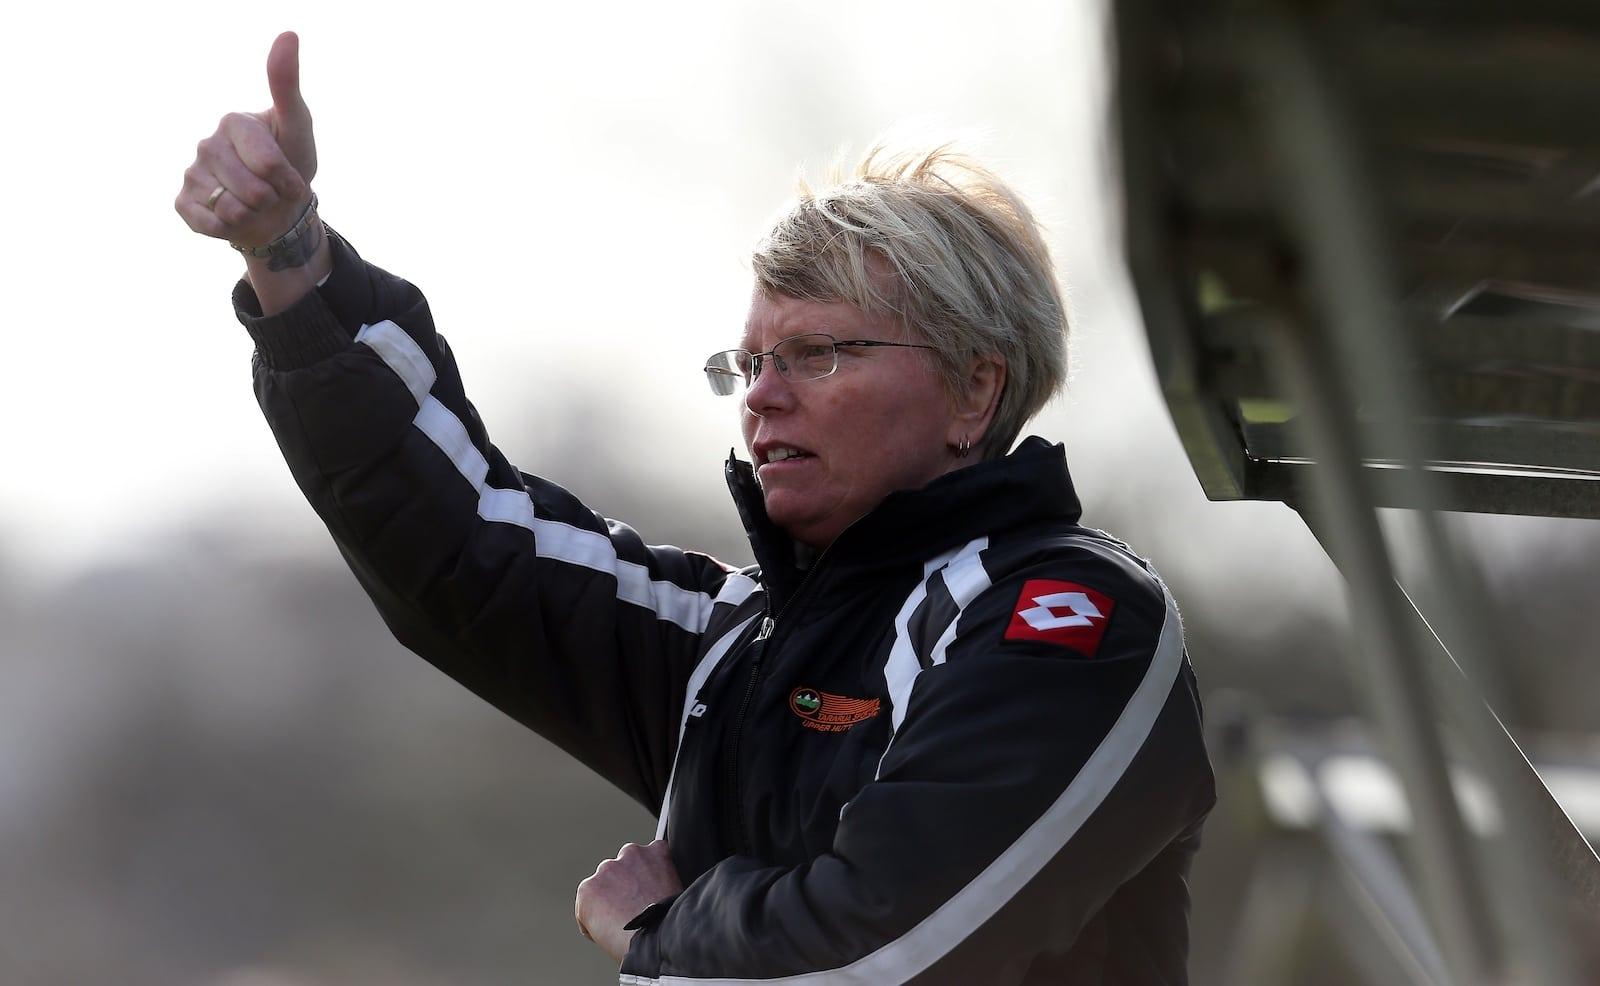 Wendi Henderson coaching